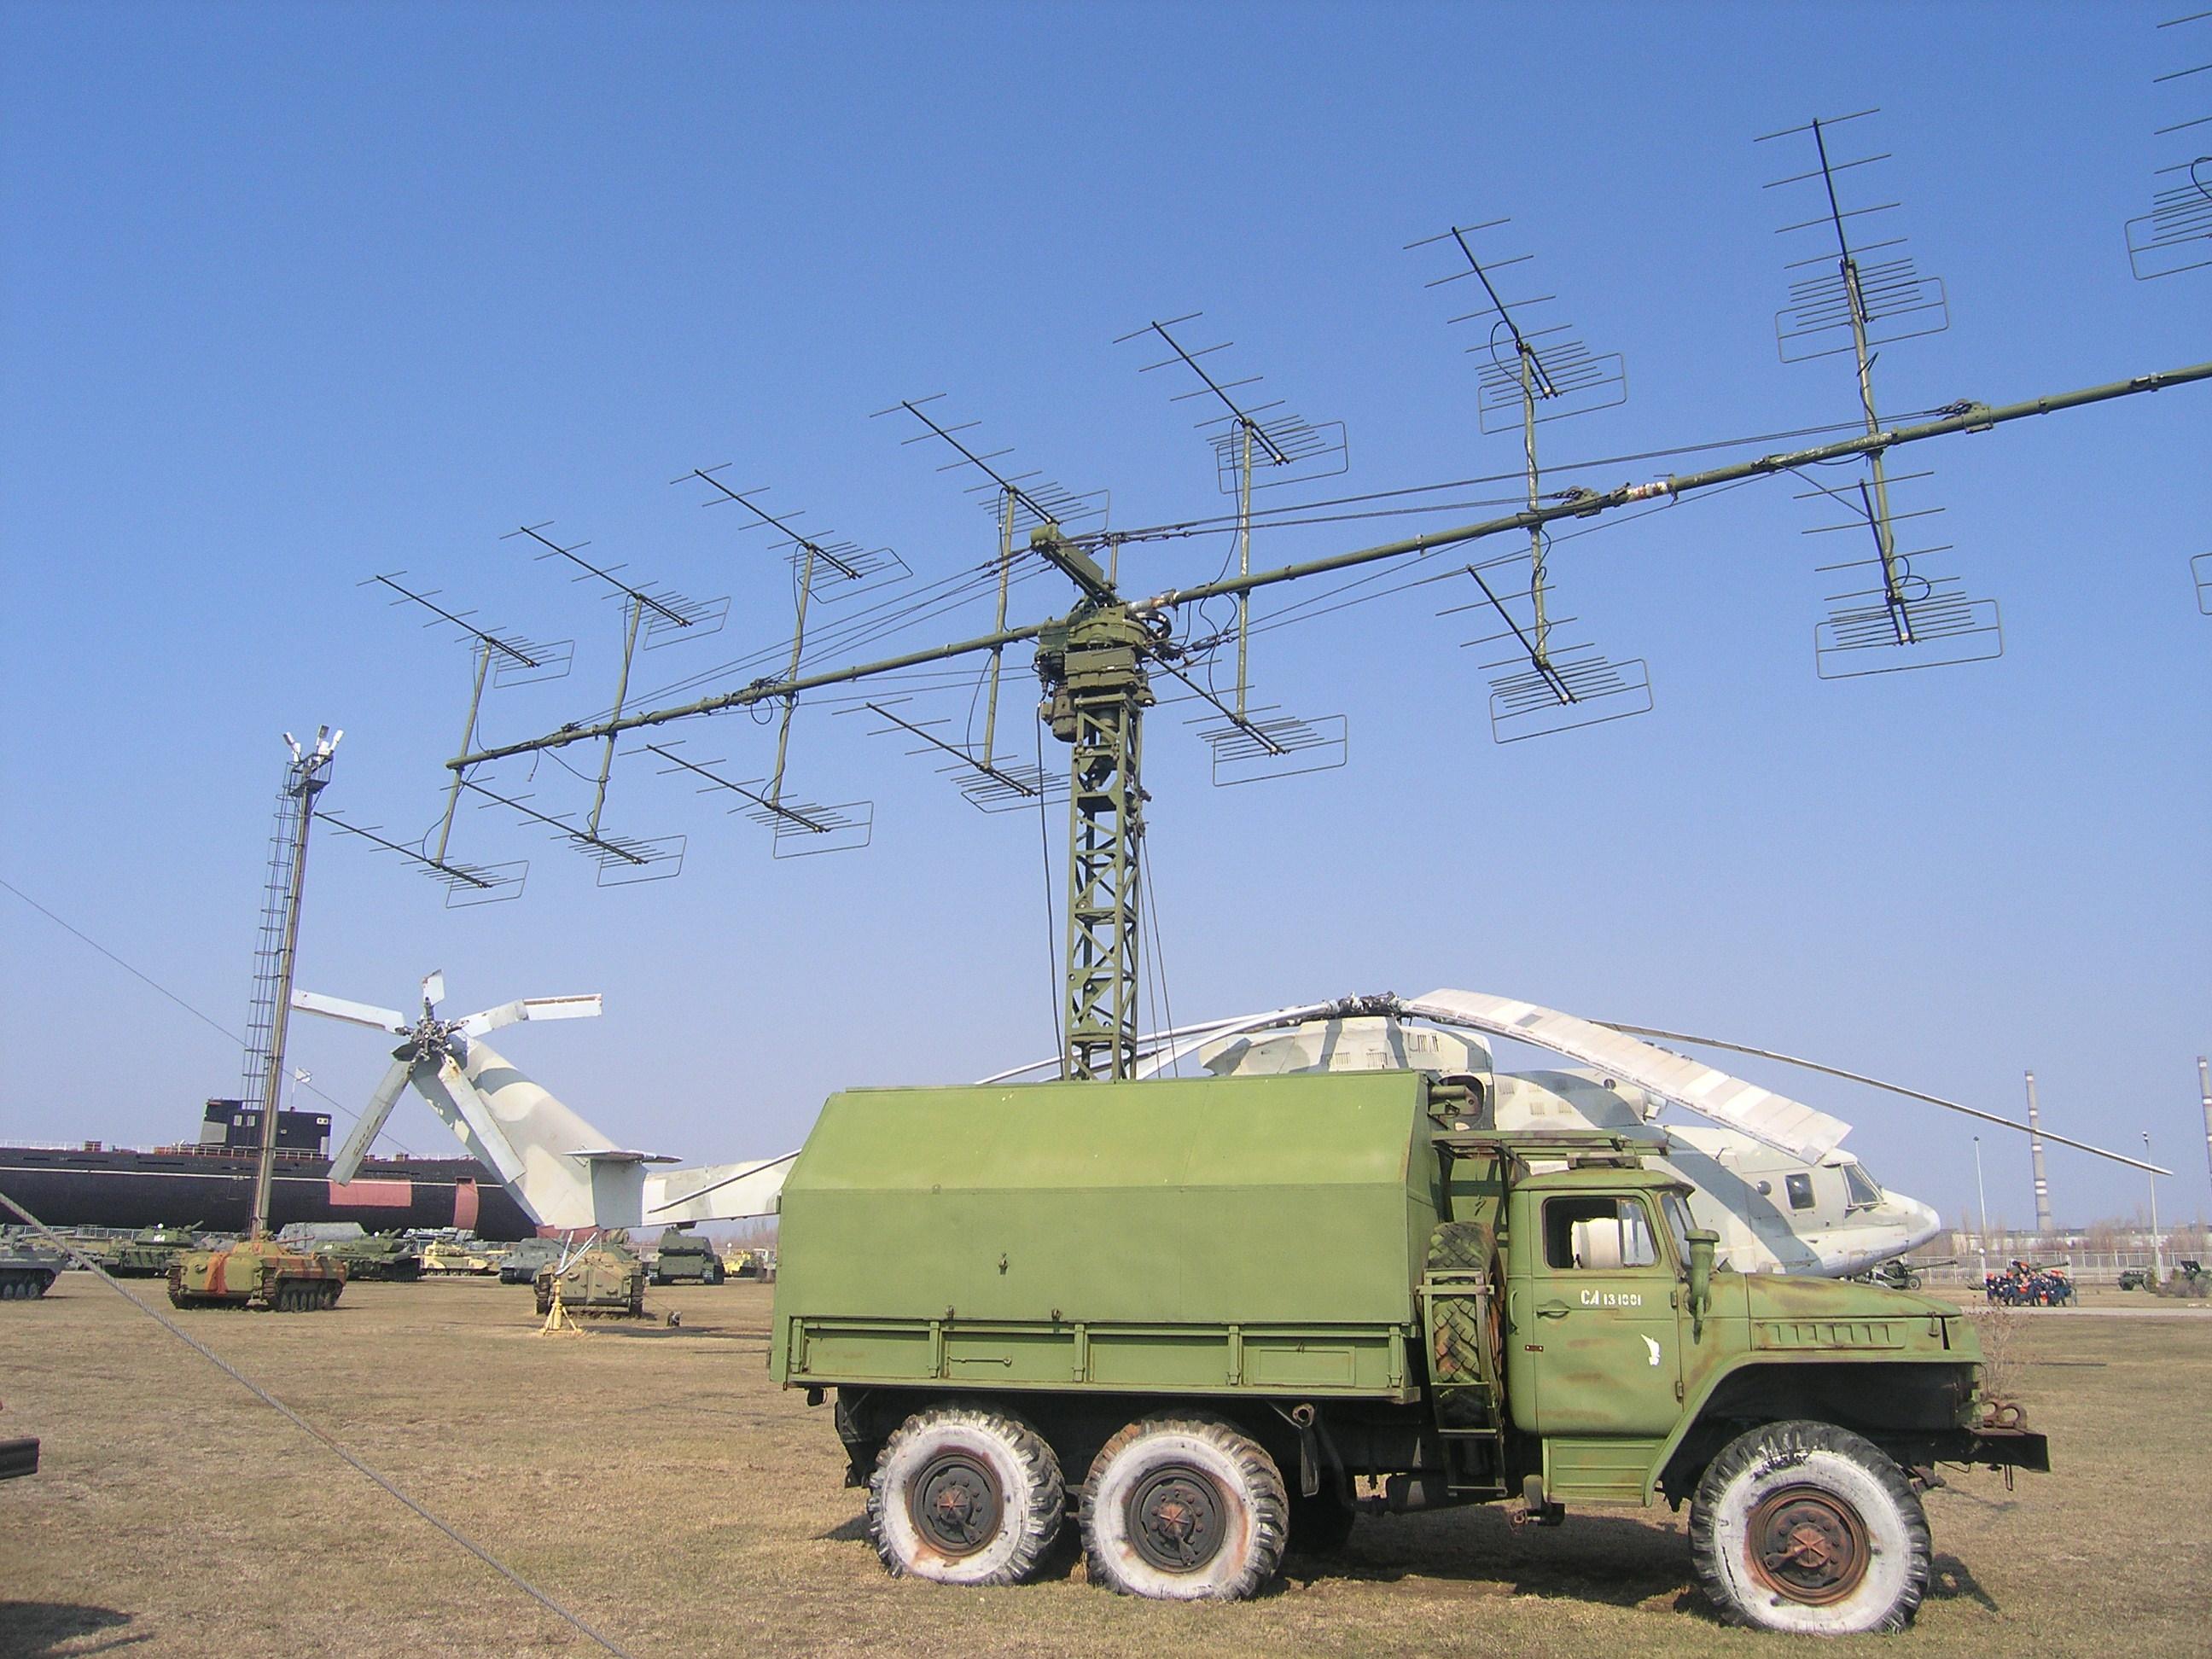 File P-18 Air Defense Radar System-1 Jpg